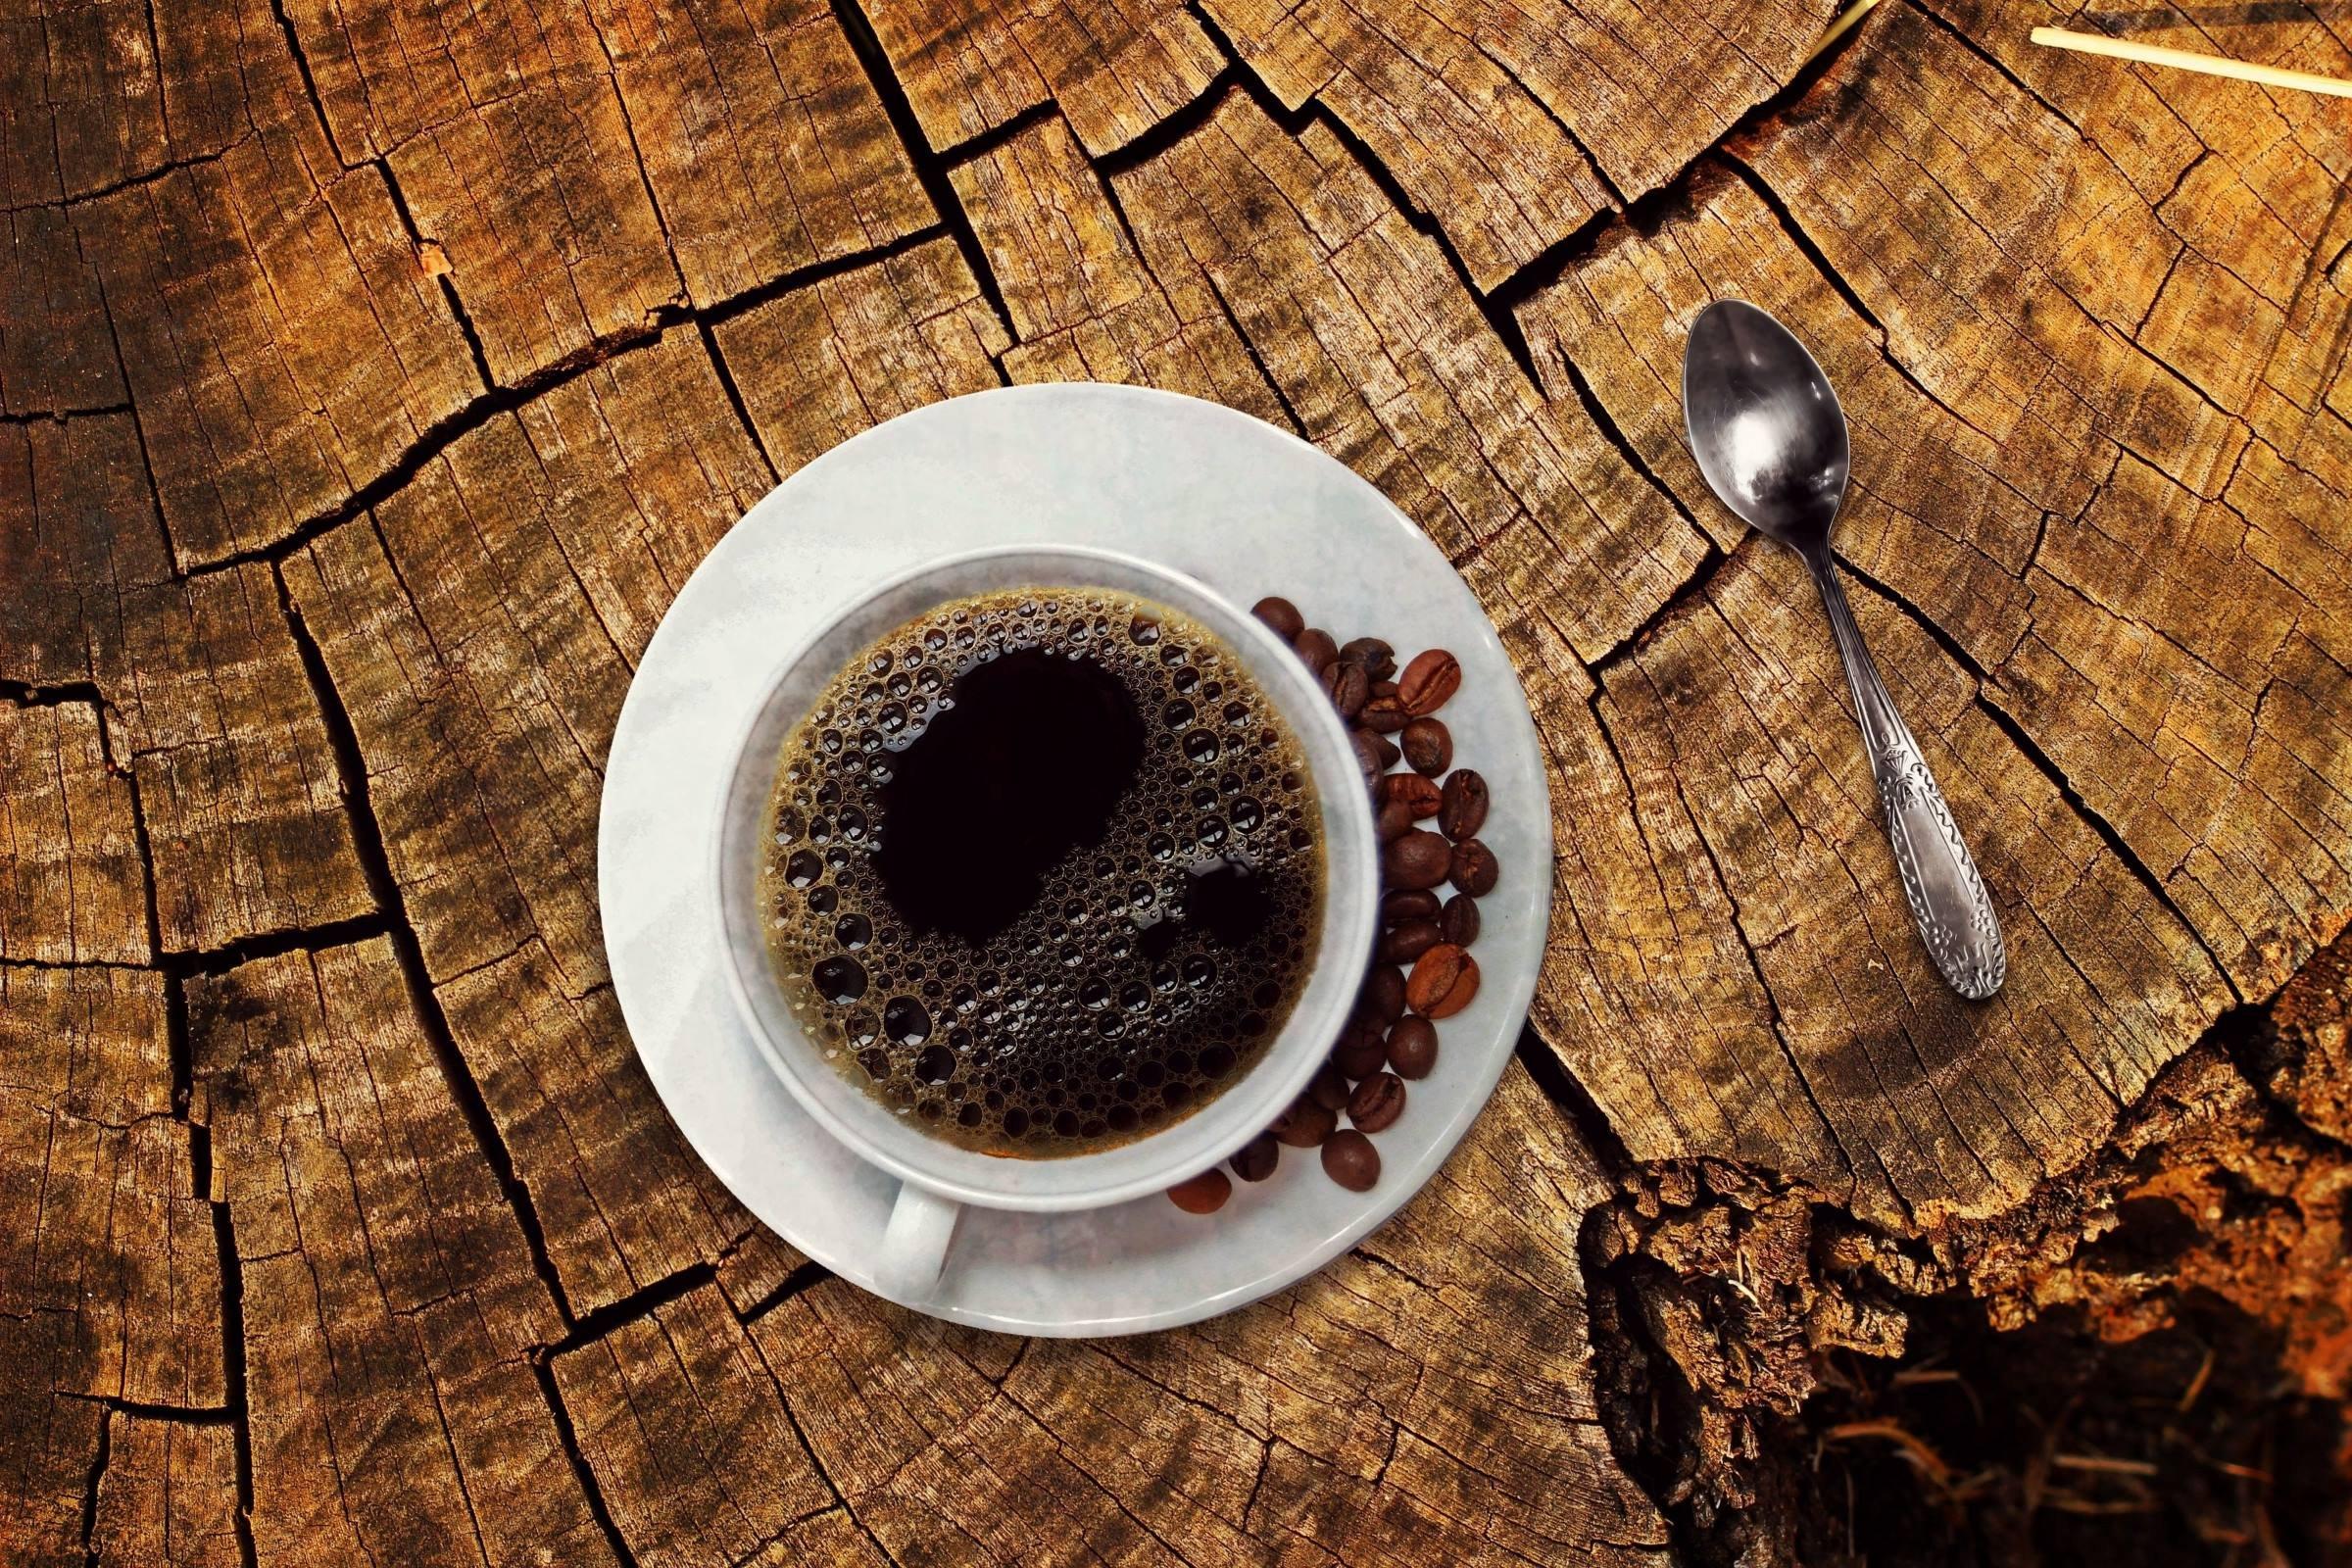 Cup of black coffee on tree stump